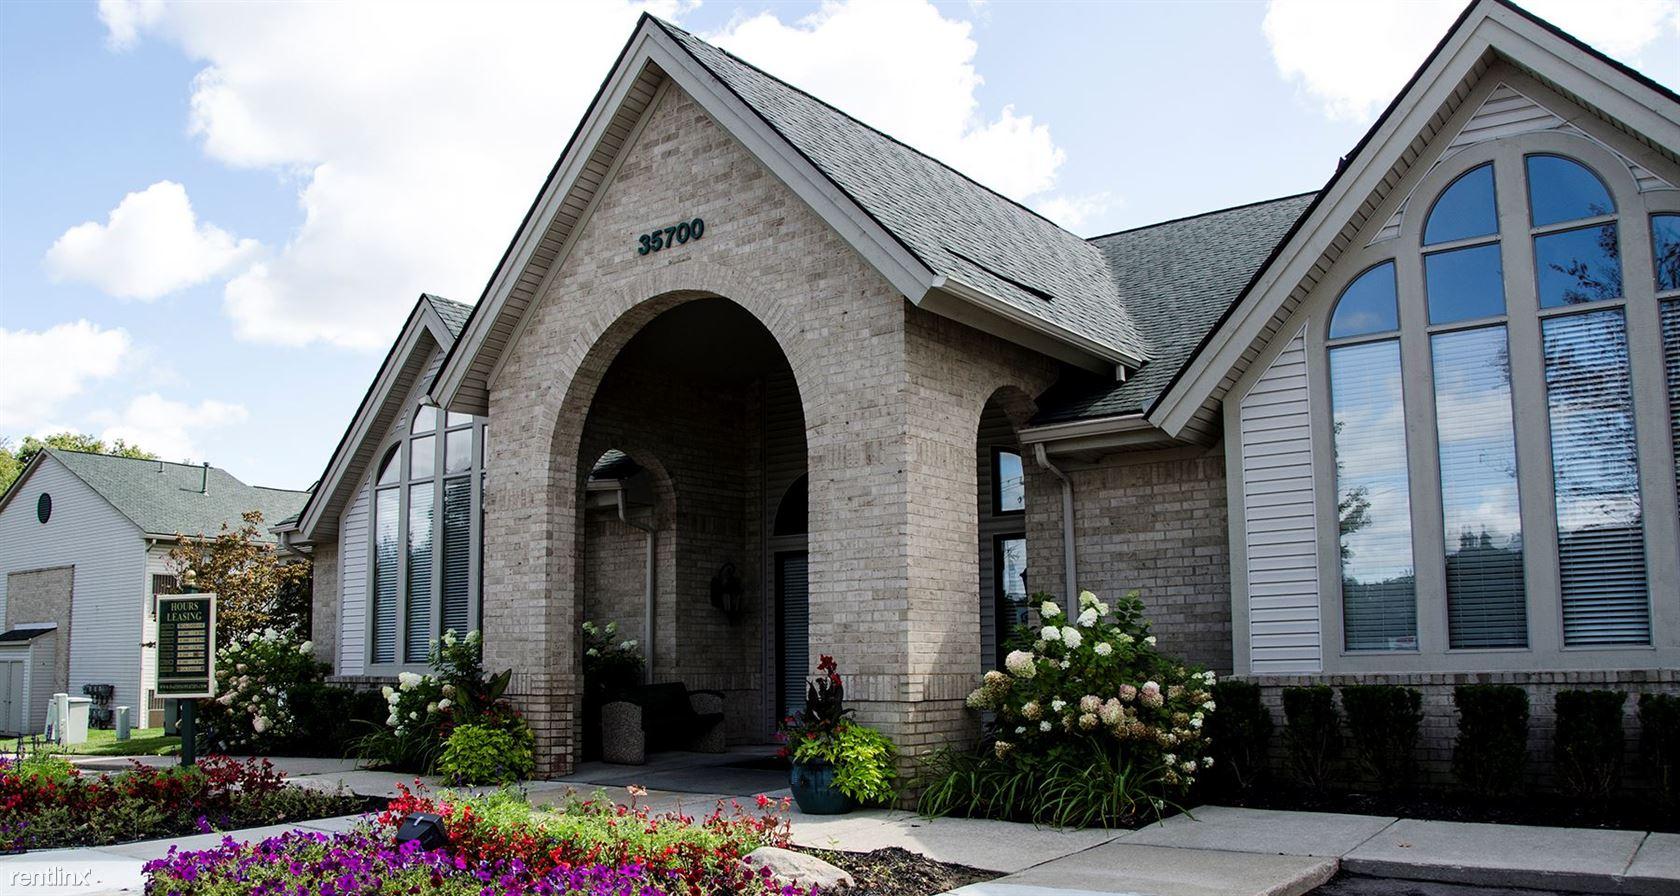 35700 Moravian Dr, Clinton Township, MI - $2,400 USD/ month